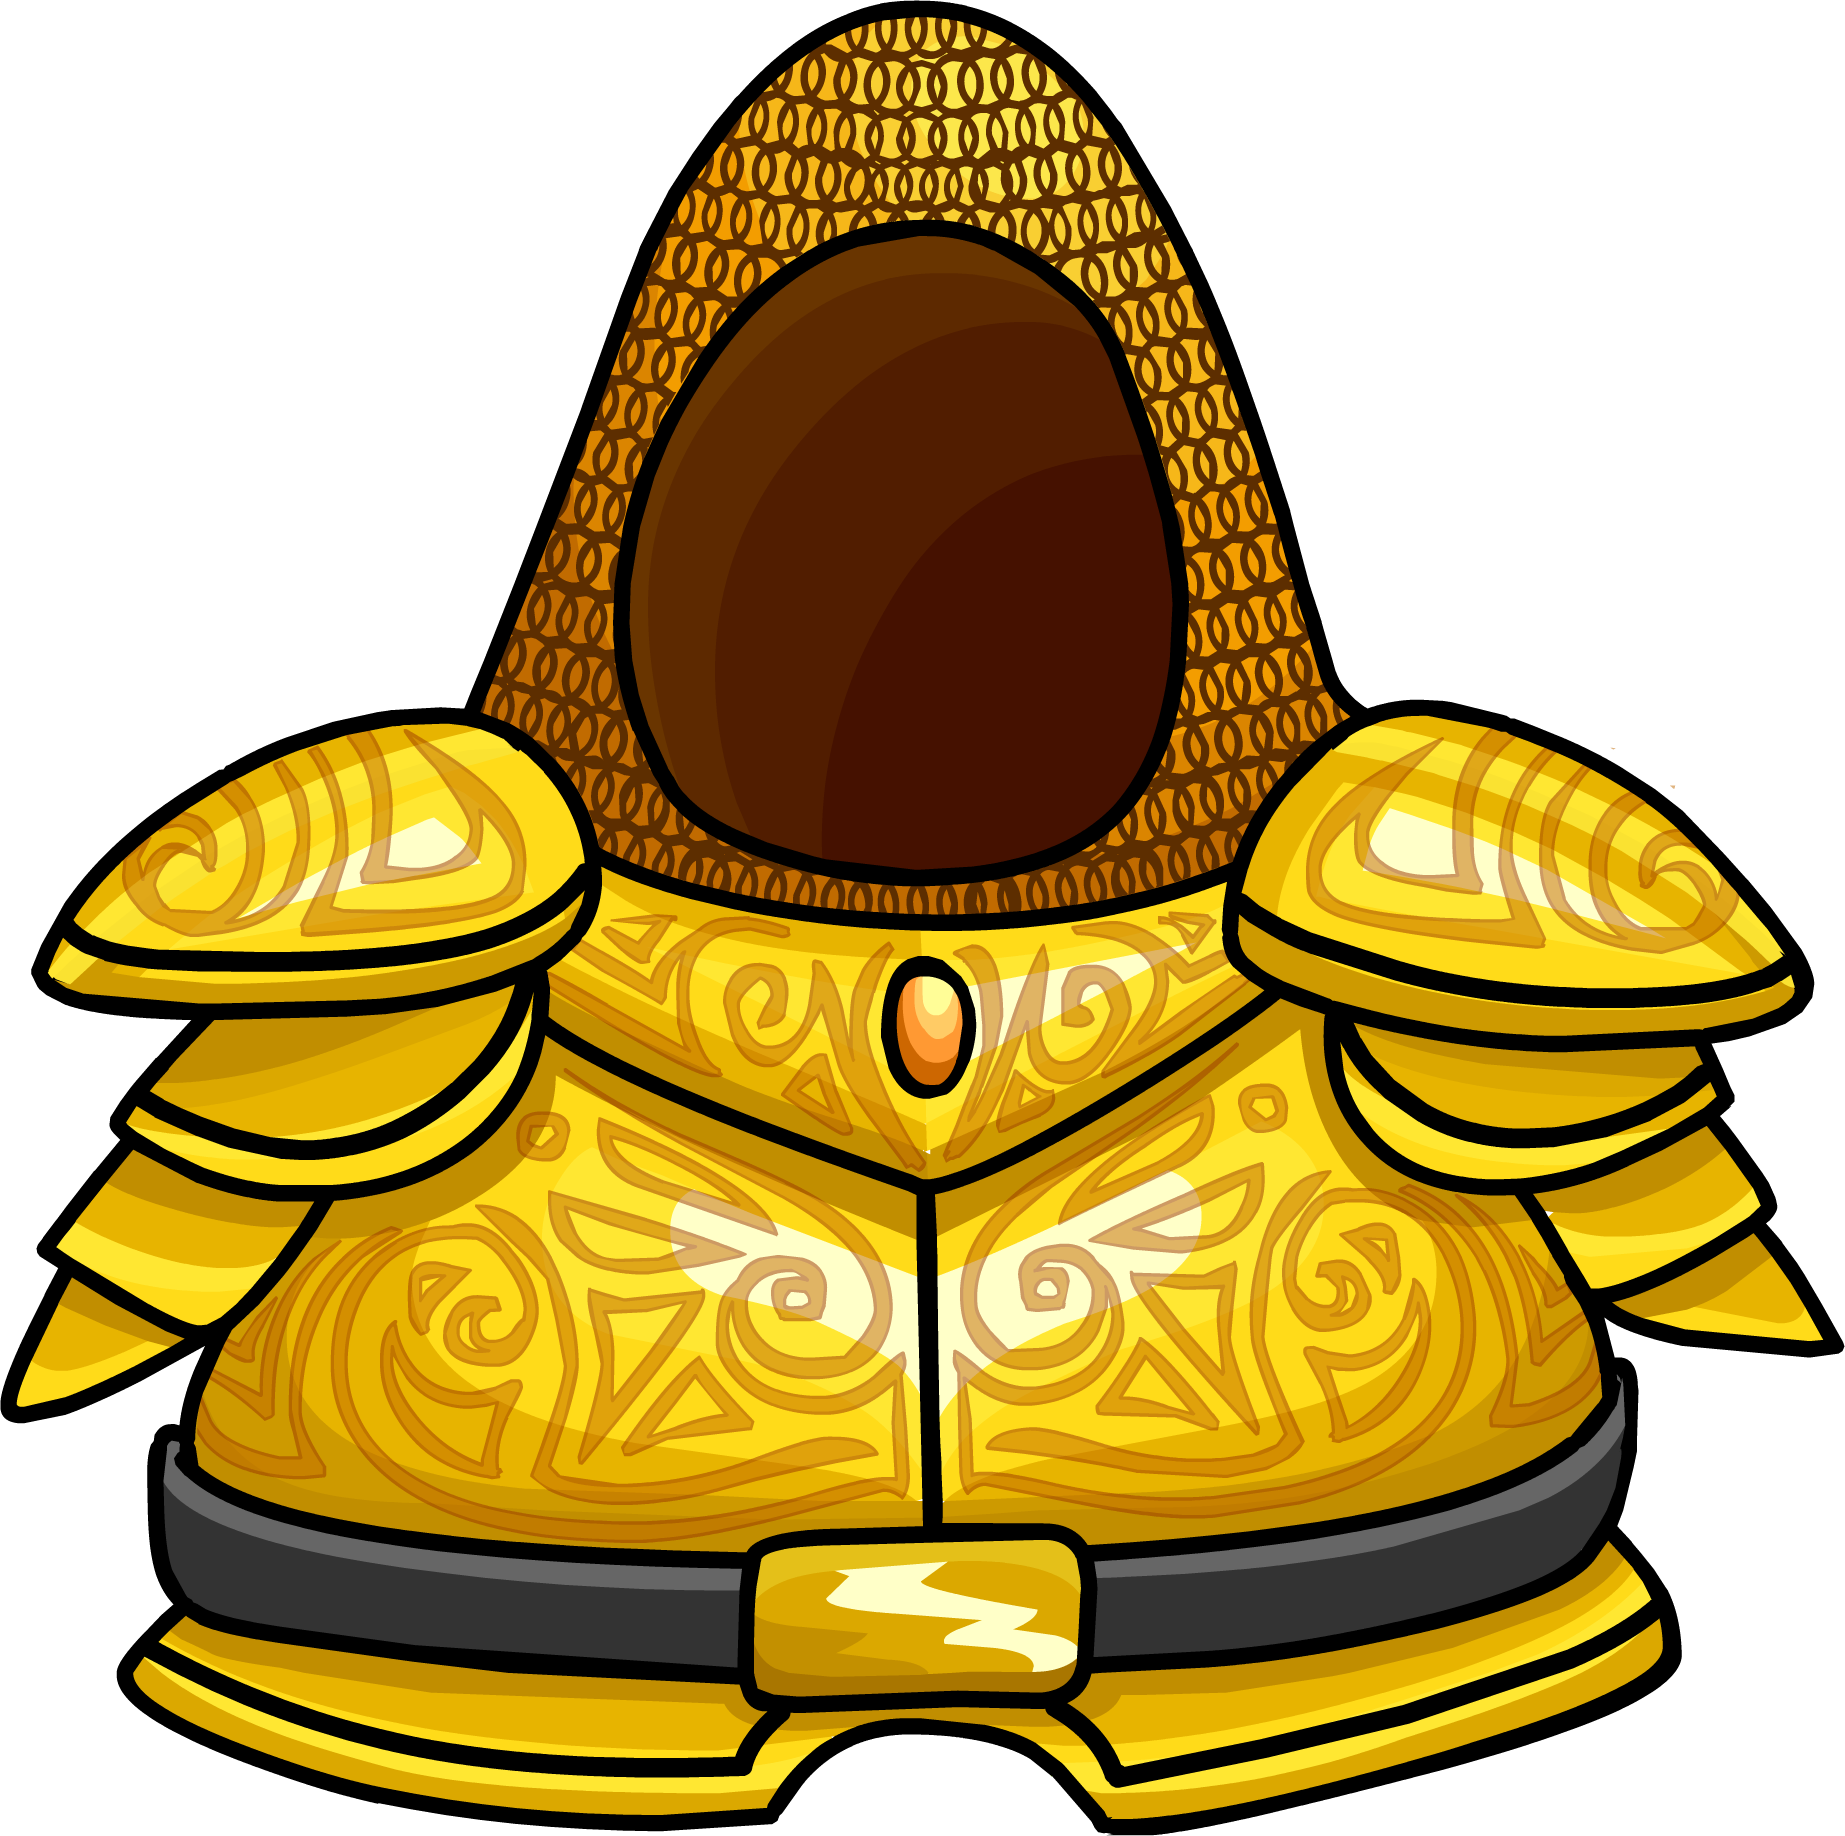 Golden Knight's Armor